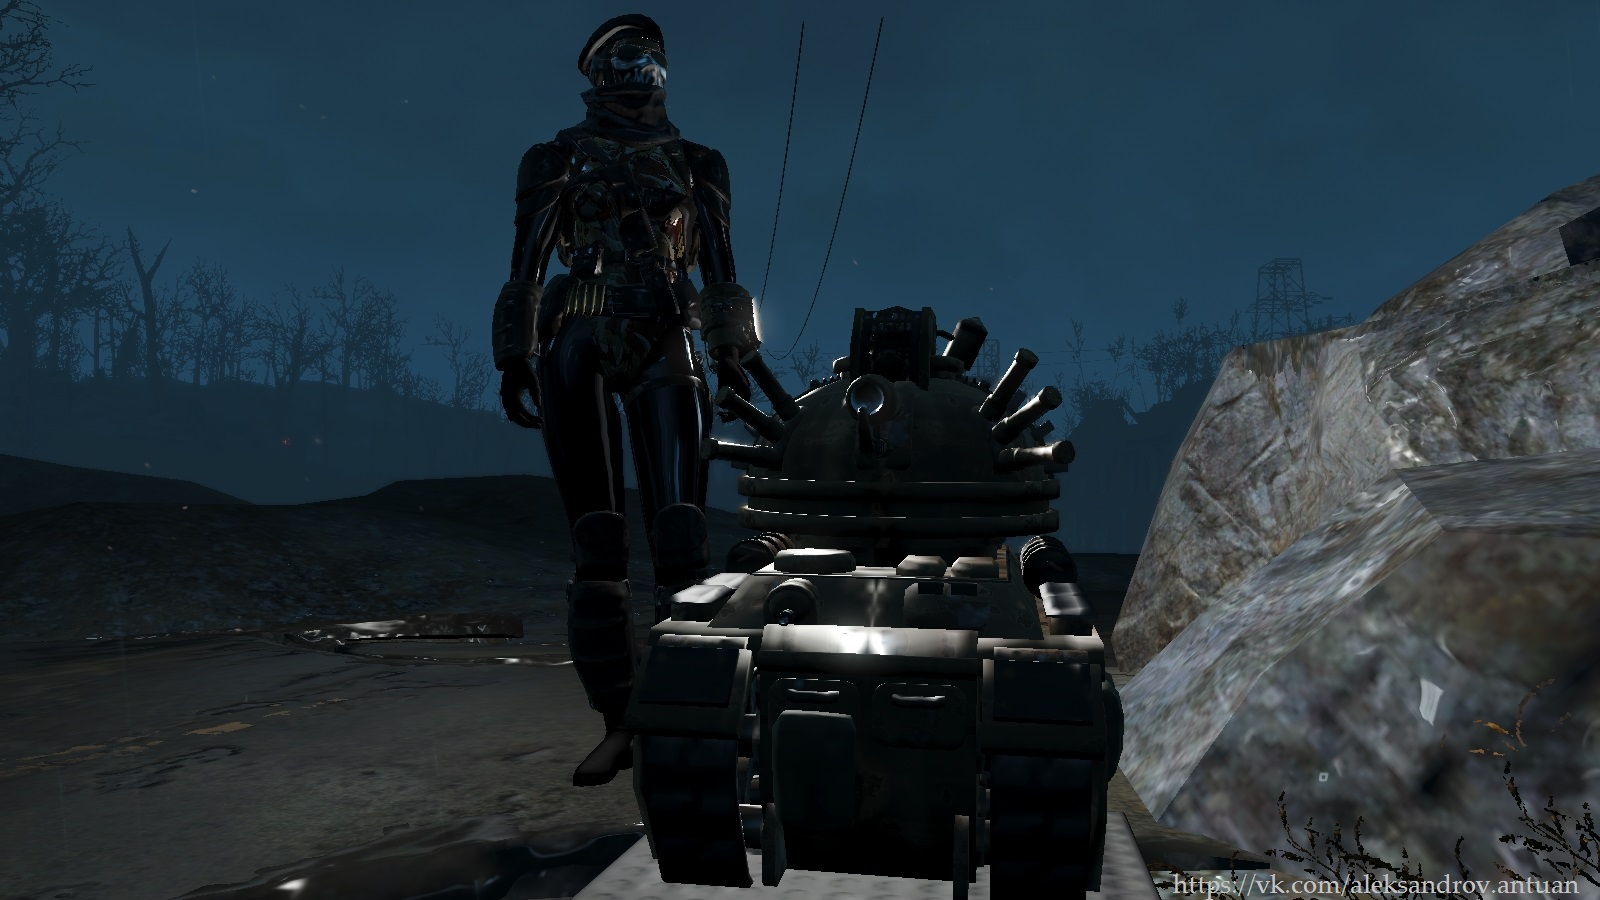 Мини-Танк ... - Fallout 4 automatron sd tank, Лодочный домик Таффингтона, Танк-автоматрон